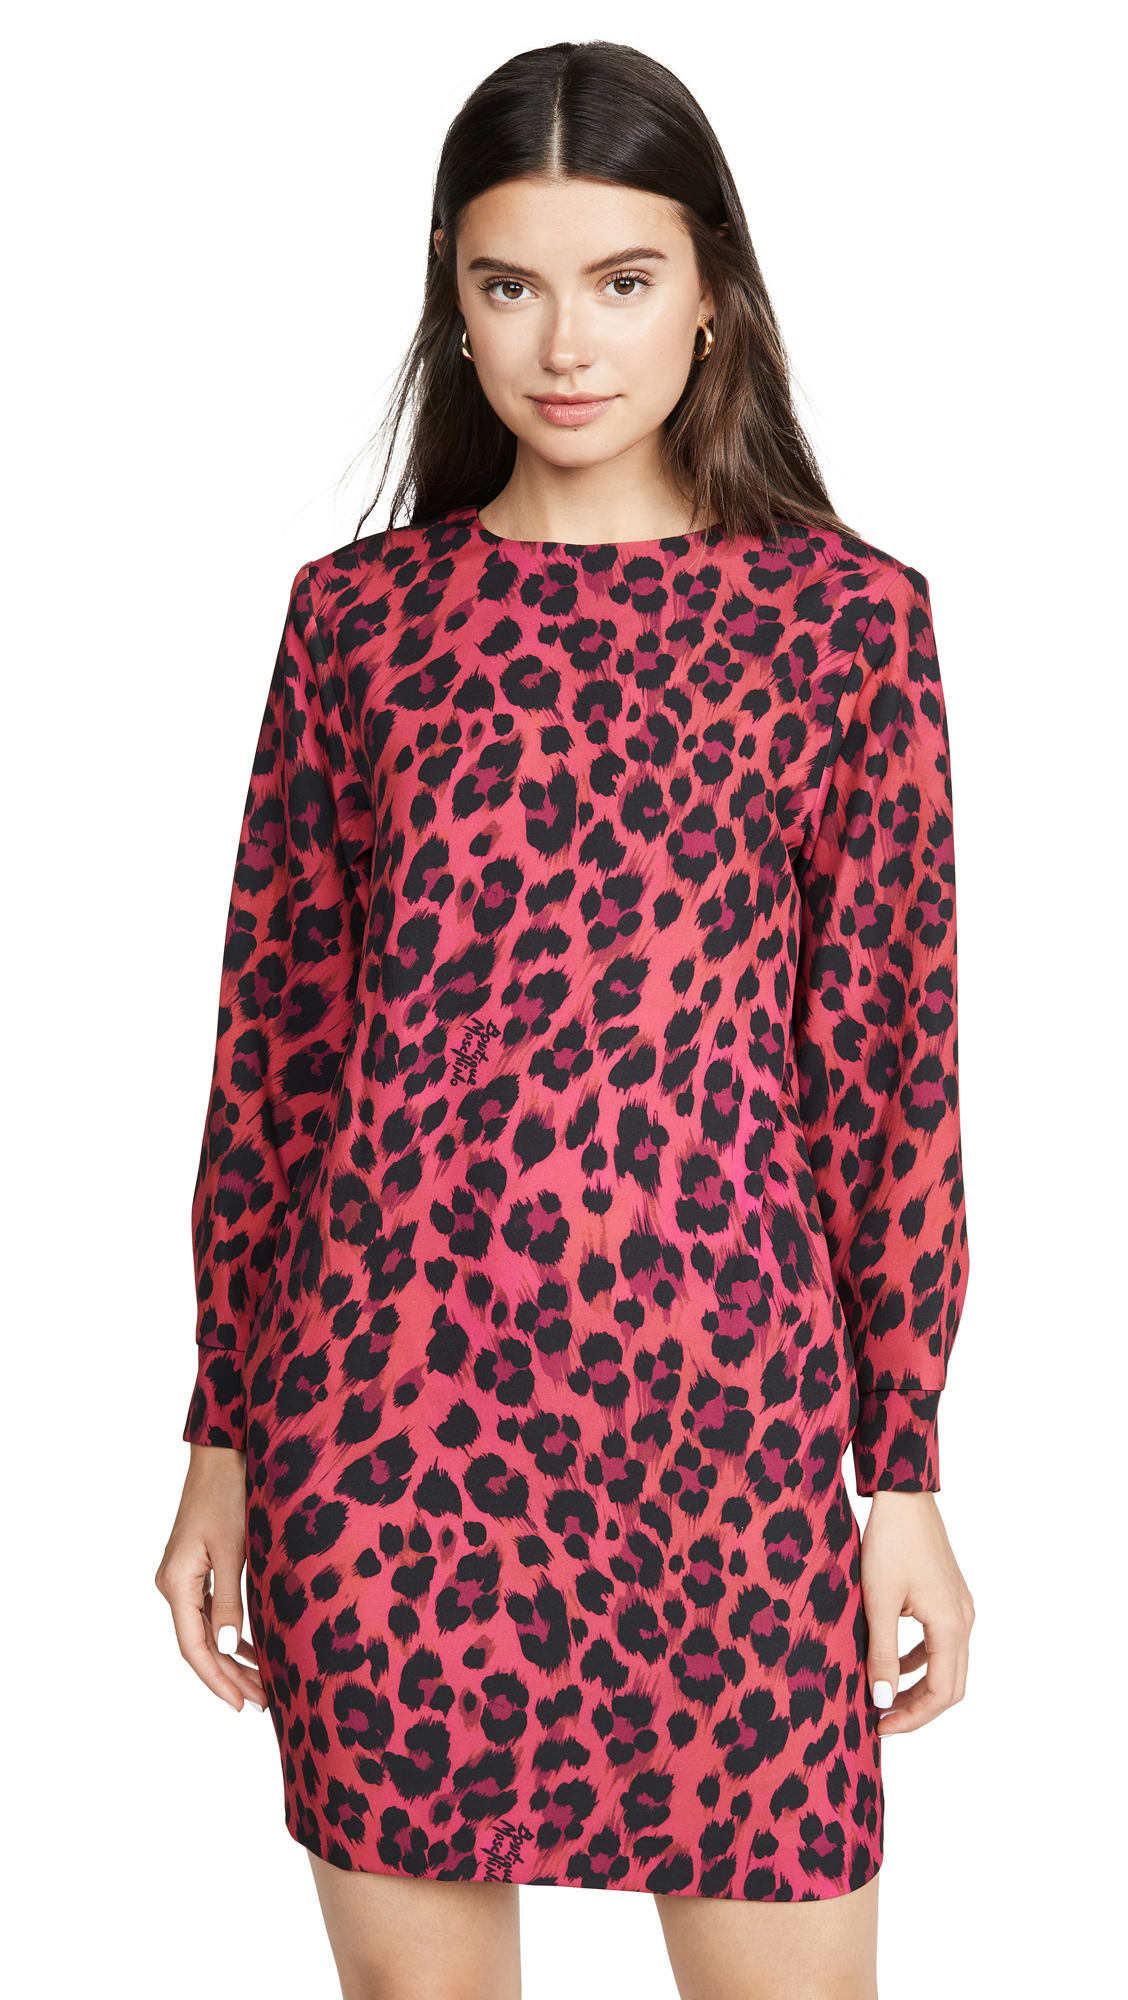 Boutique Moschino Long Sleeve Pink Leopard Dress - Fantasy Print Fuchsia